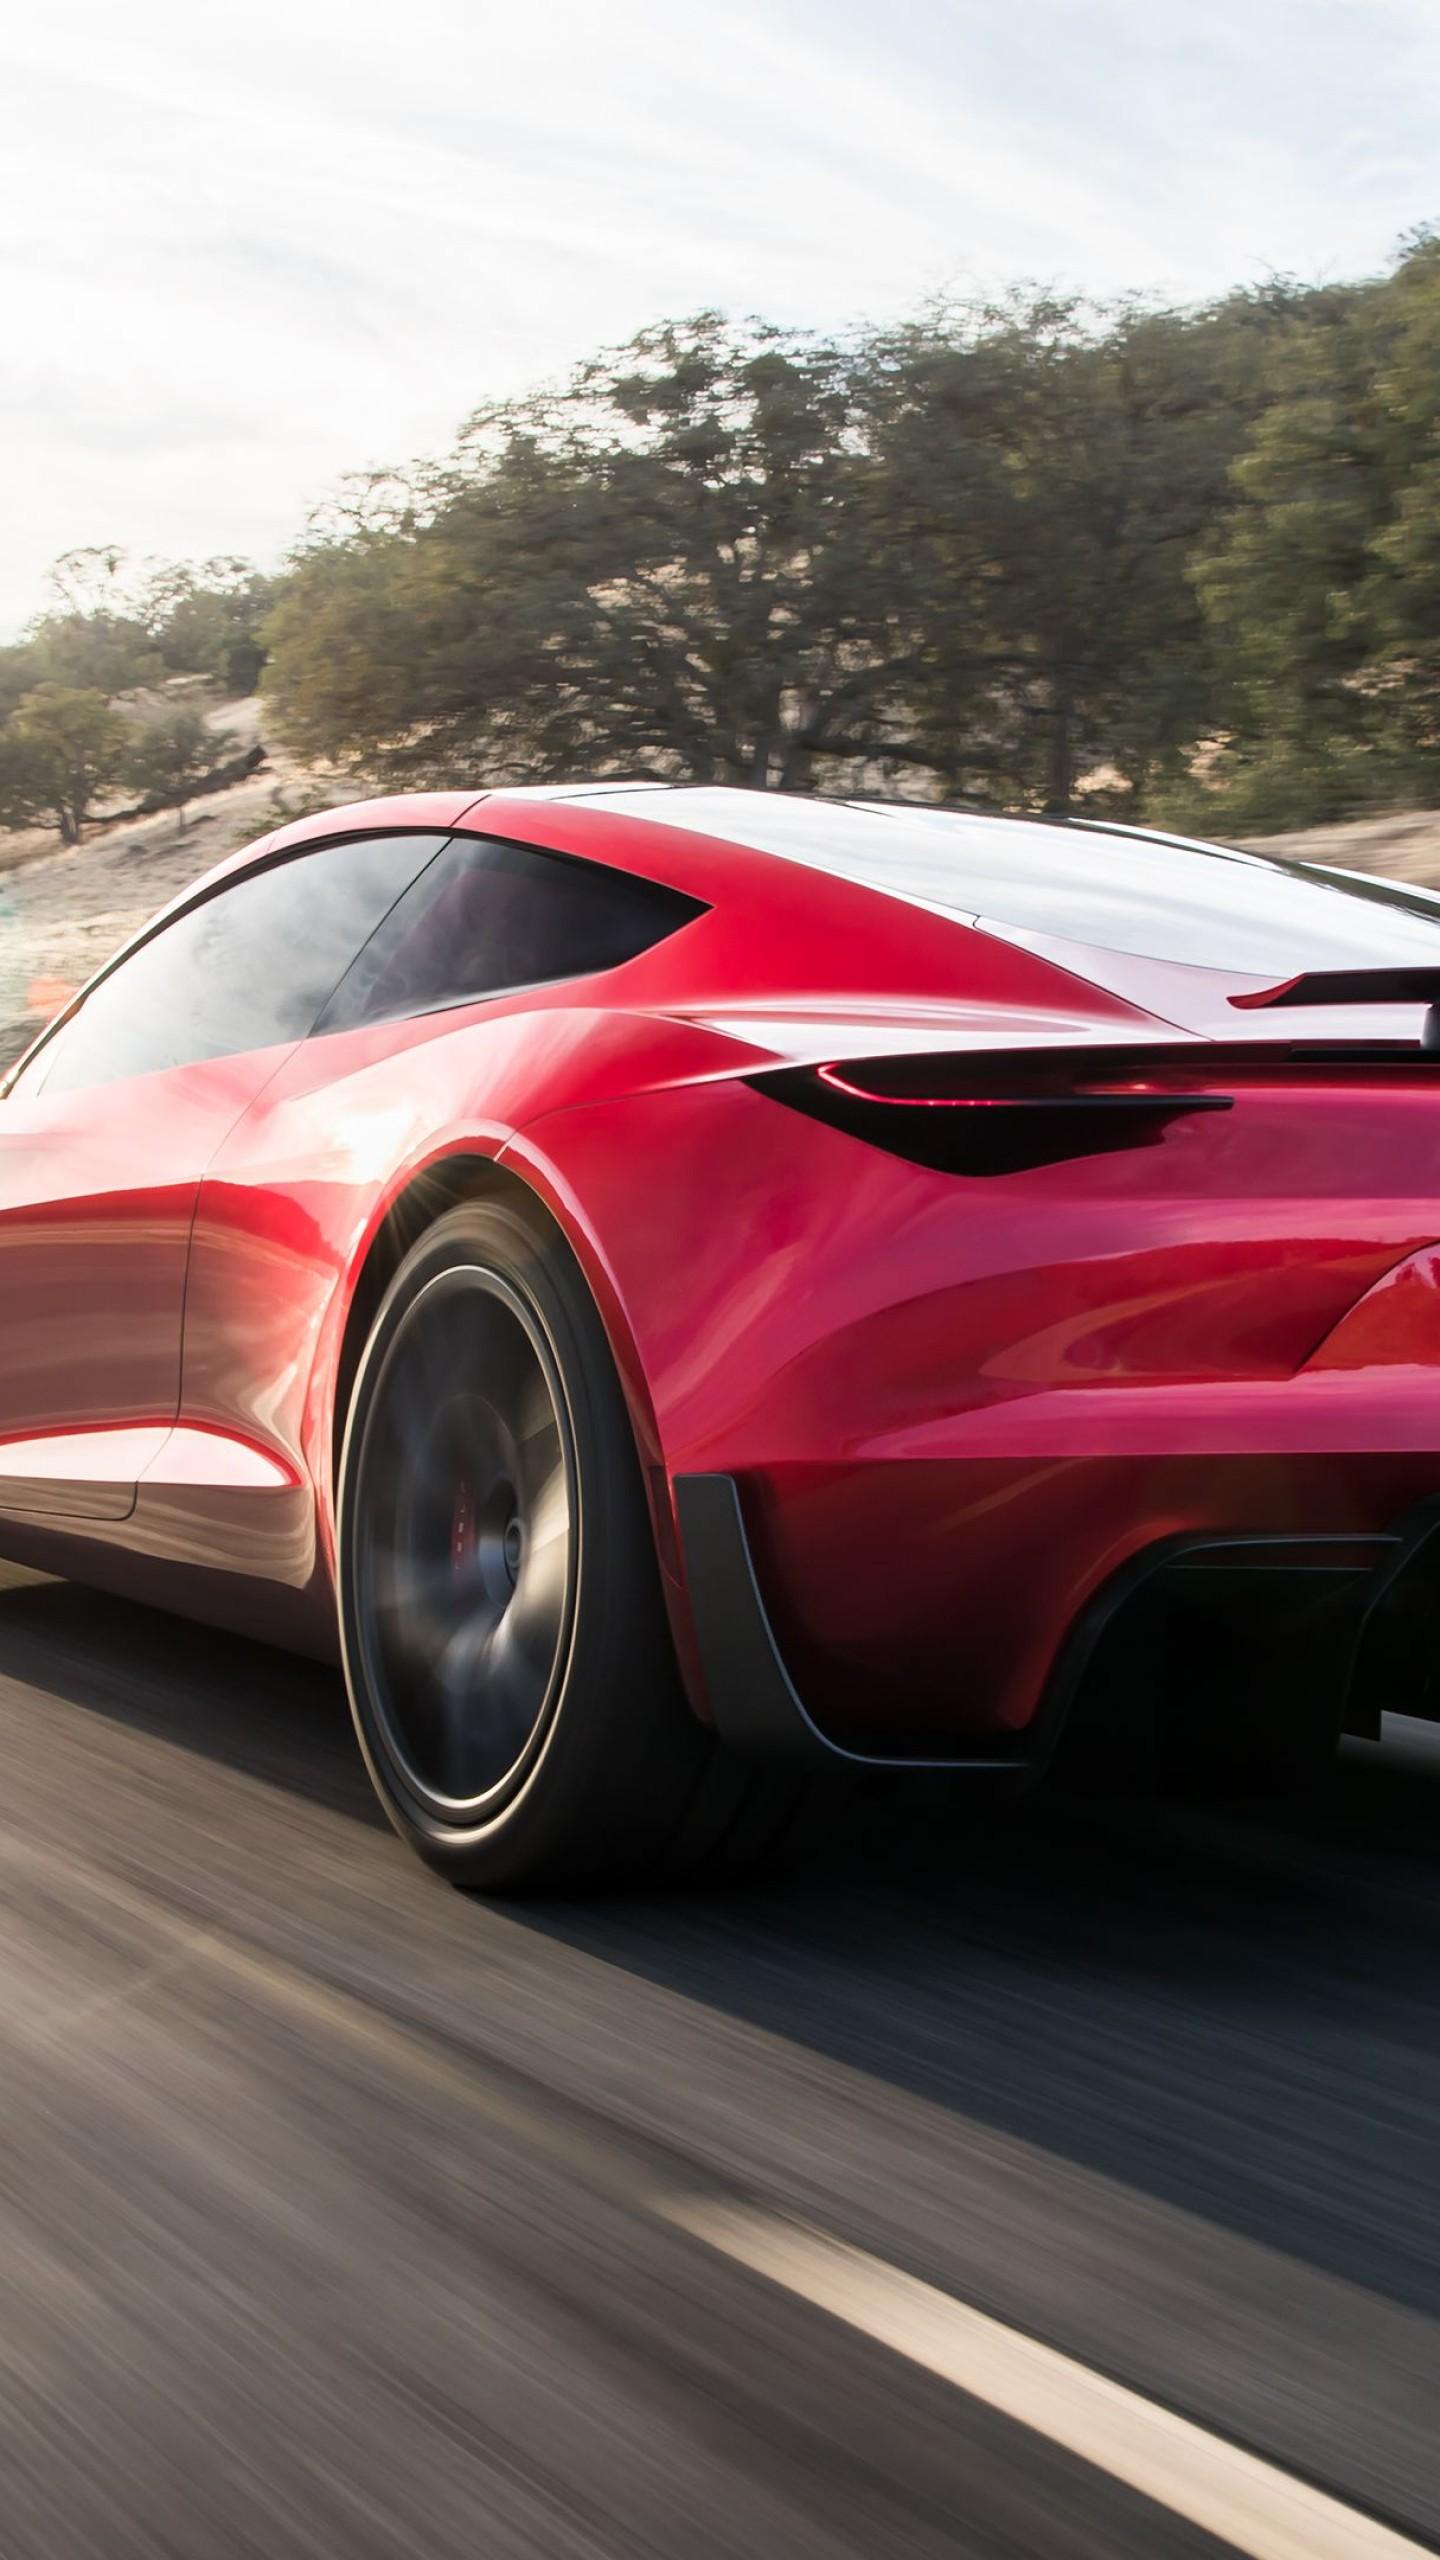 Best Choice Motors >> Wallpaper Tesla Roadster, 2020 Cars, electric car, 4K, Cars & Bikes #18477